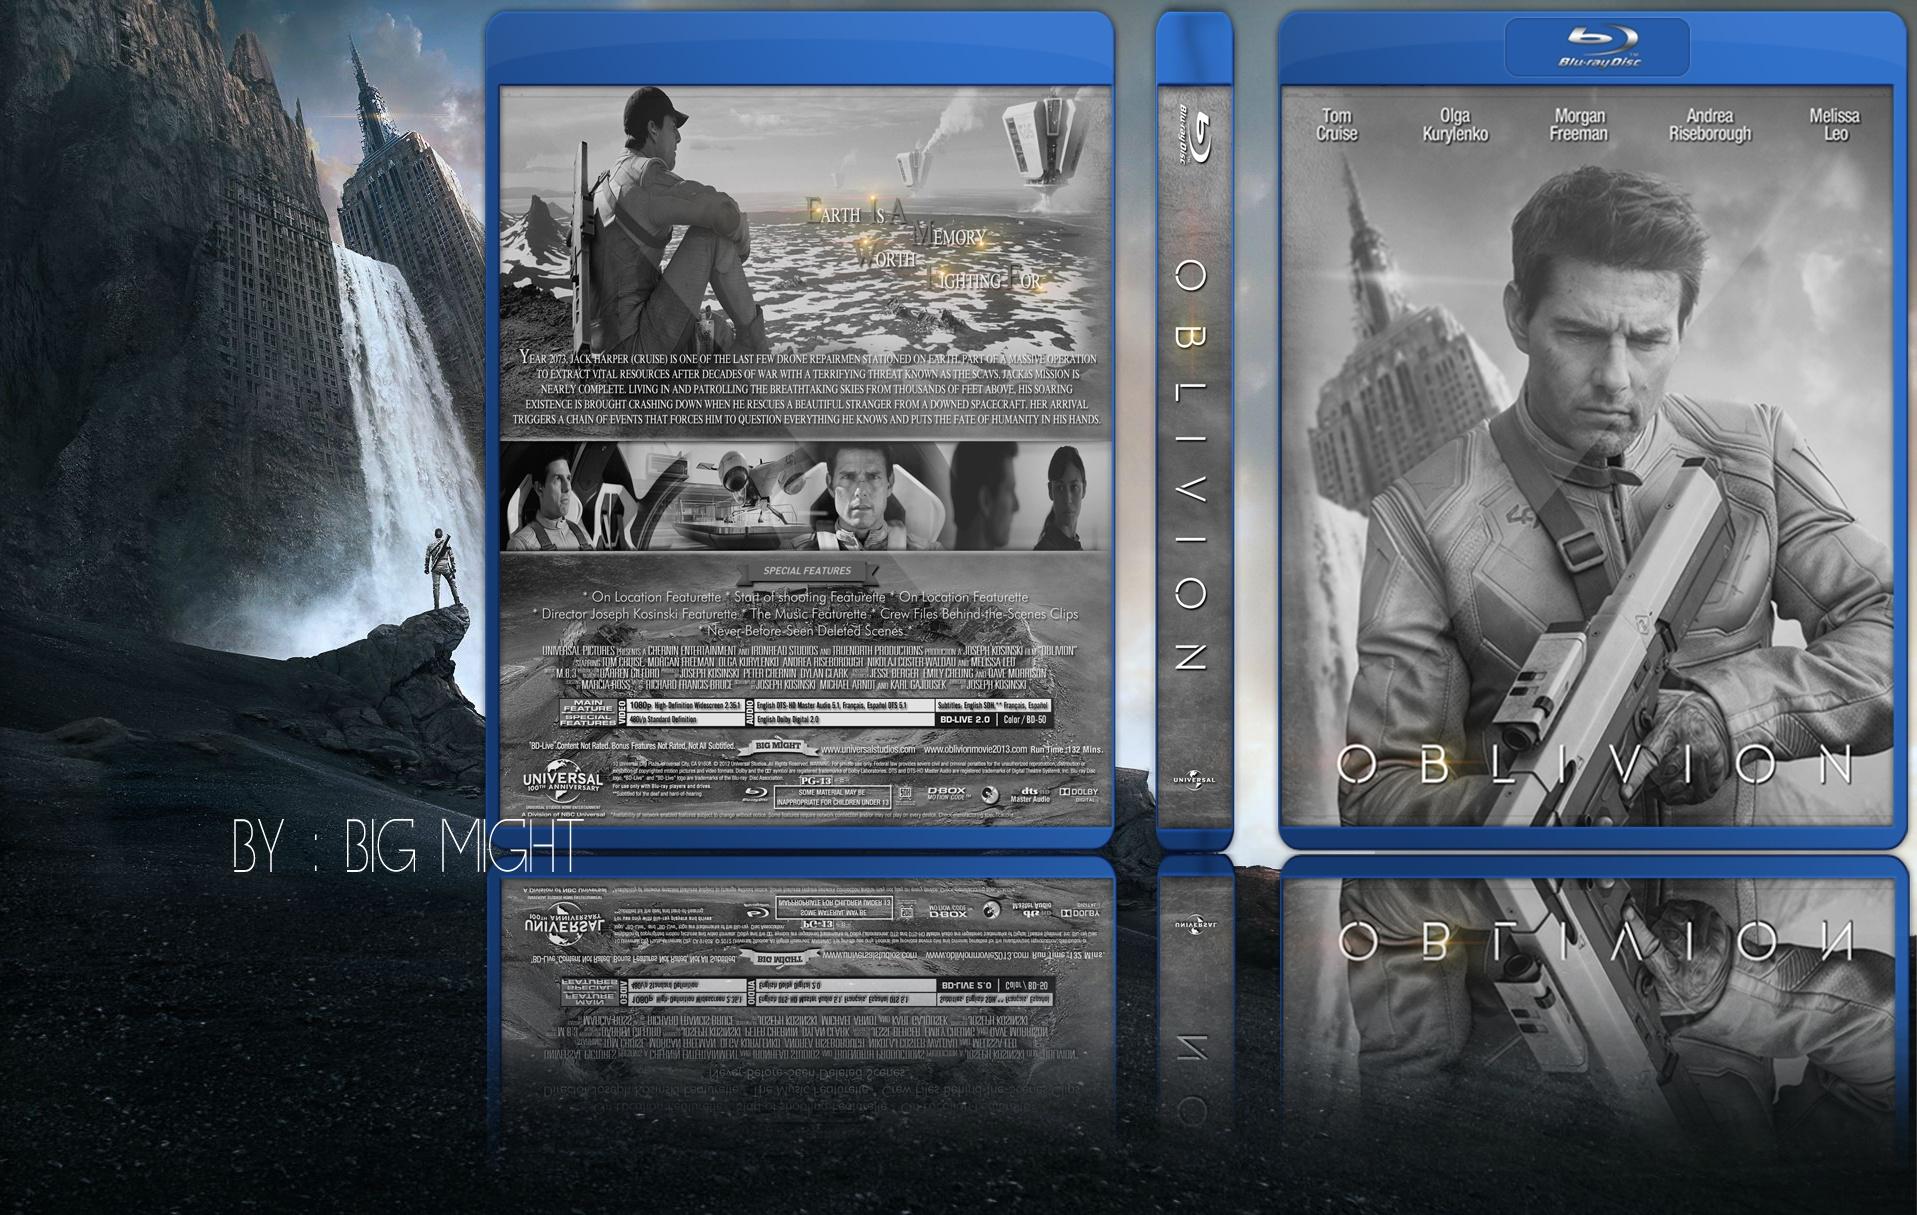 Oblivion Movie Cover Comments Oblivion br Box Cover